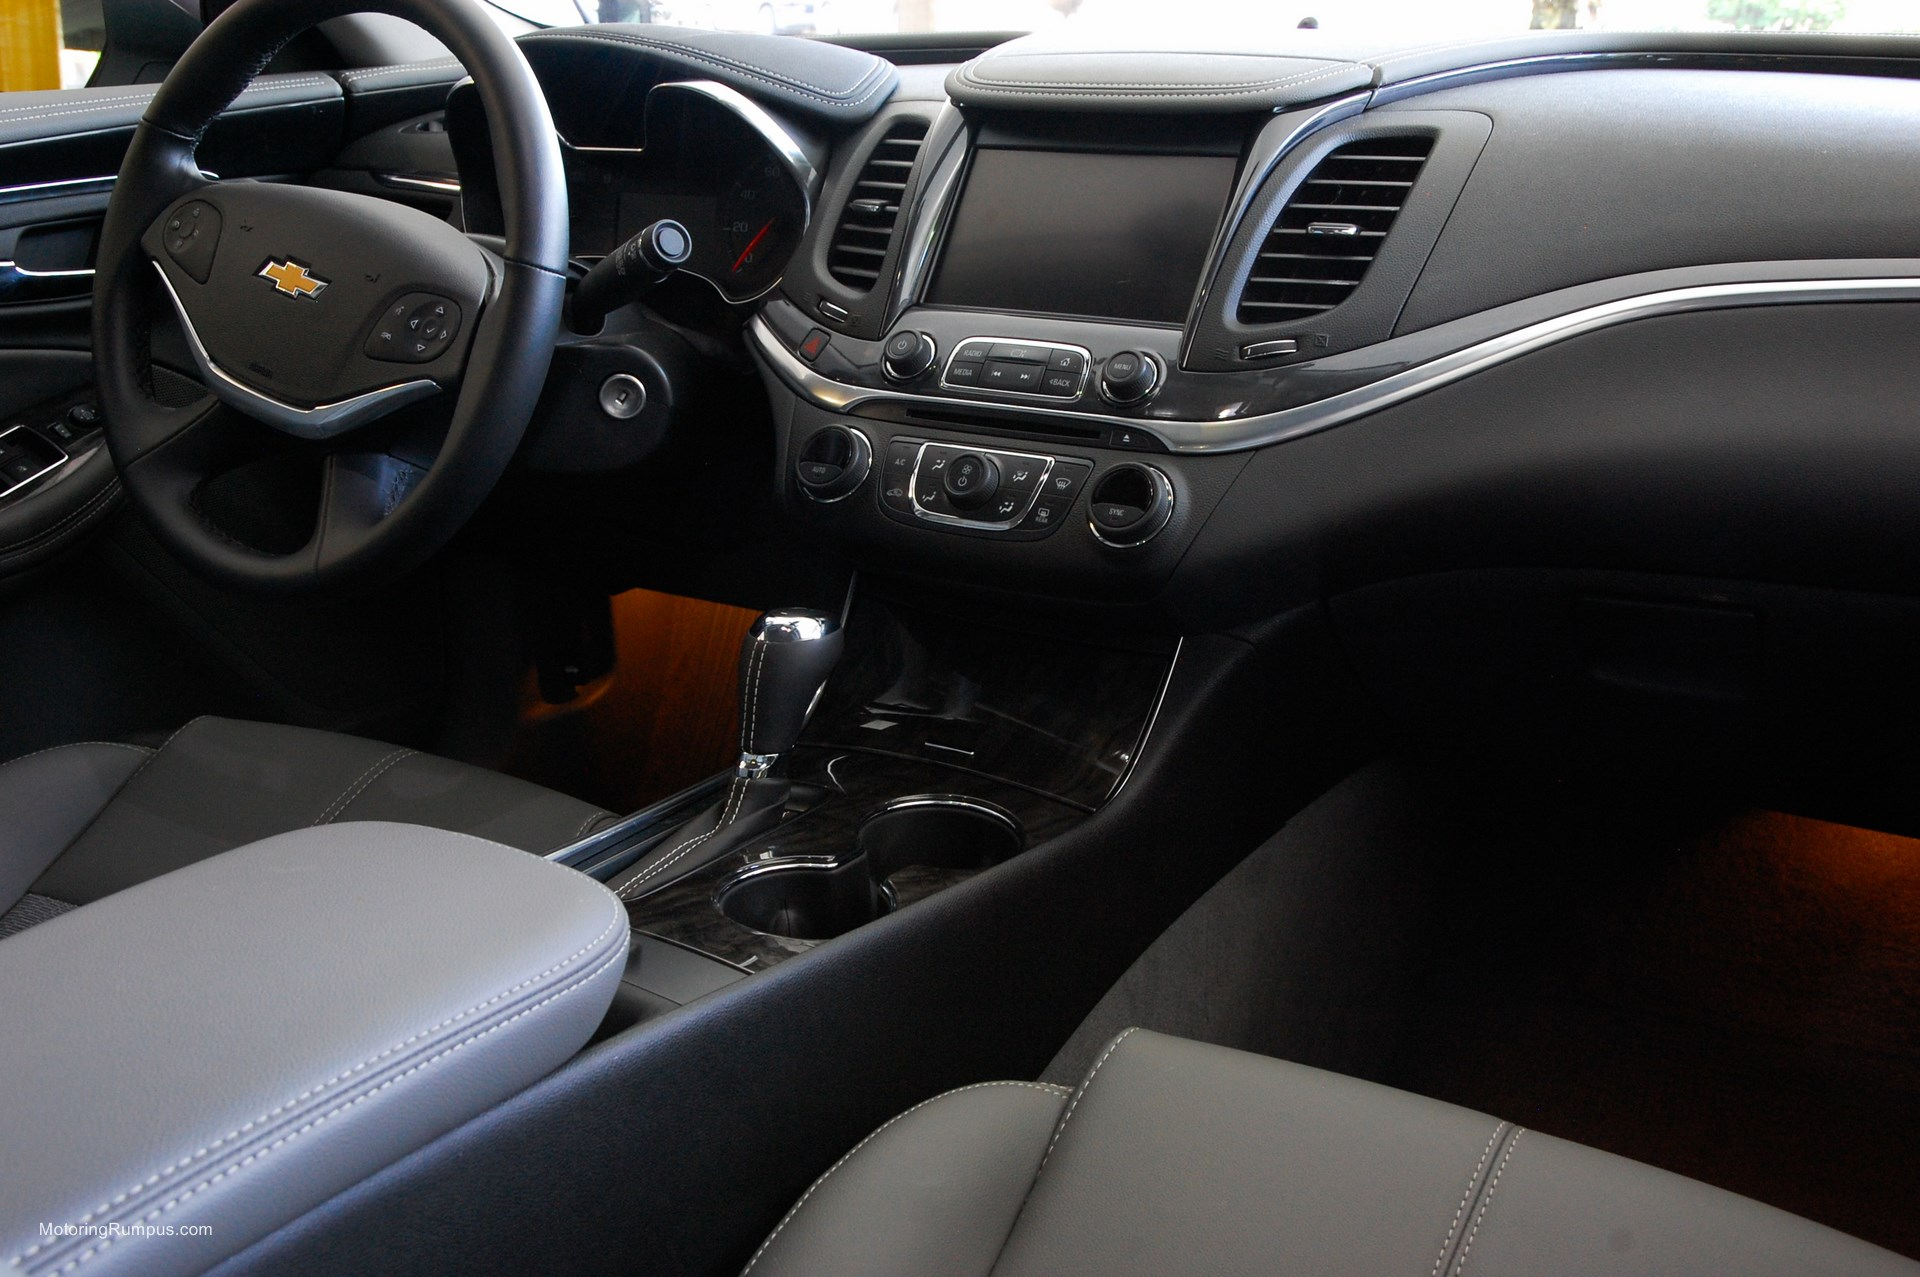 2014 Chevy Impala Review - Motoring Rumpus